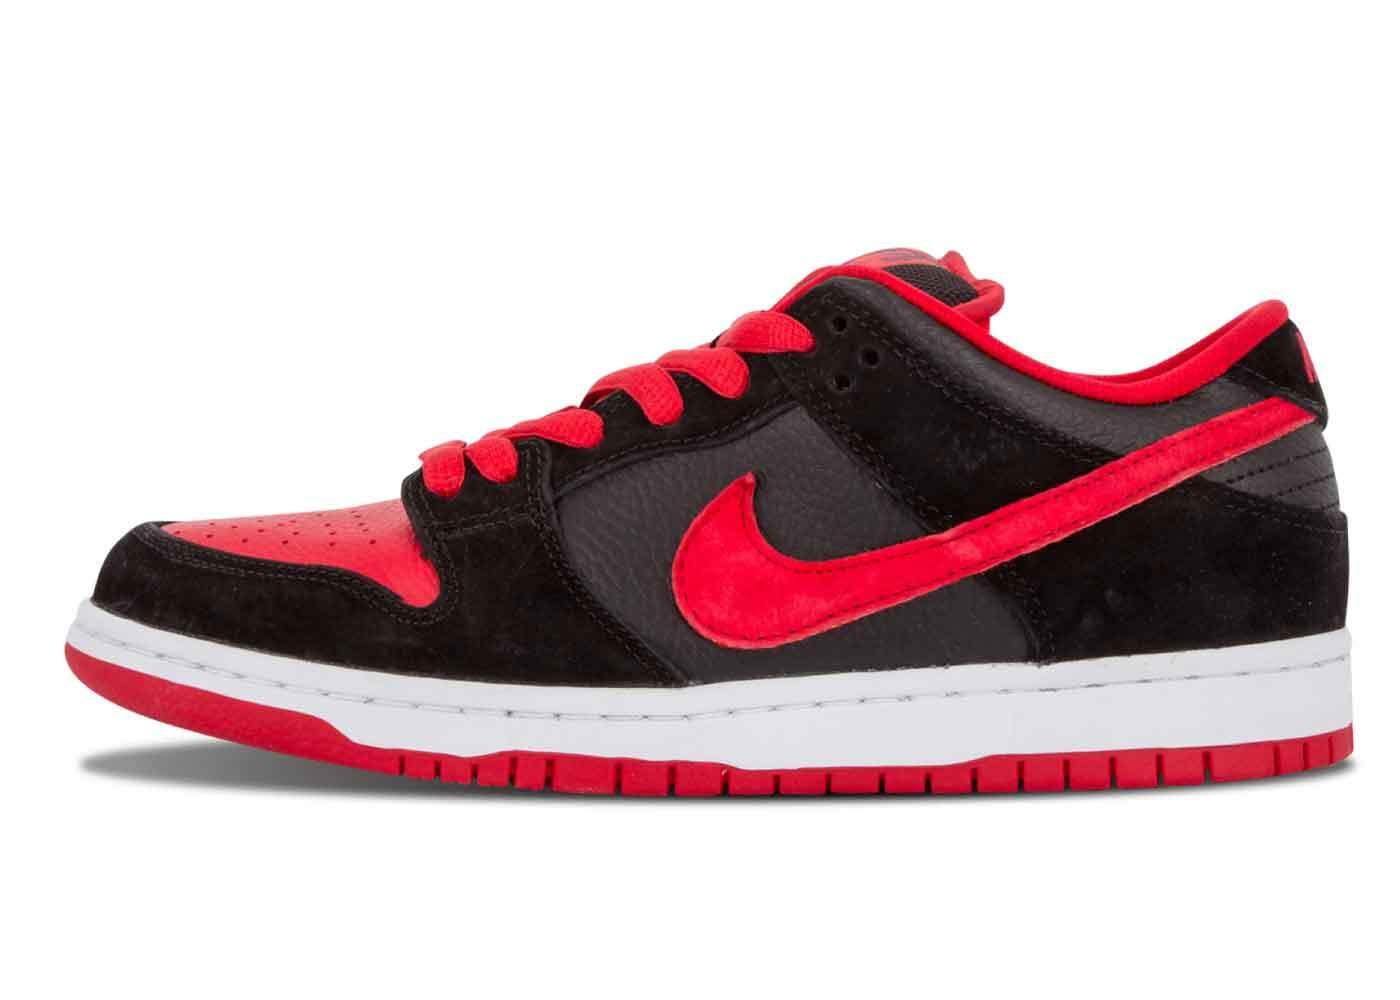 Nike SB Dunk Low J Pack Bredを安心売買